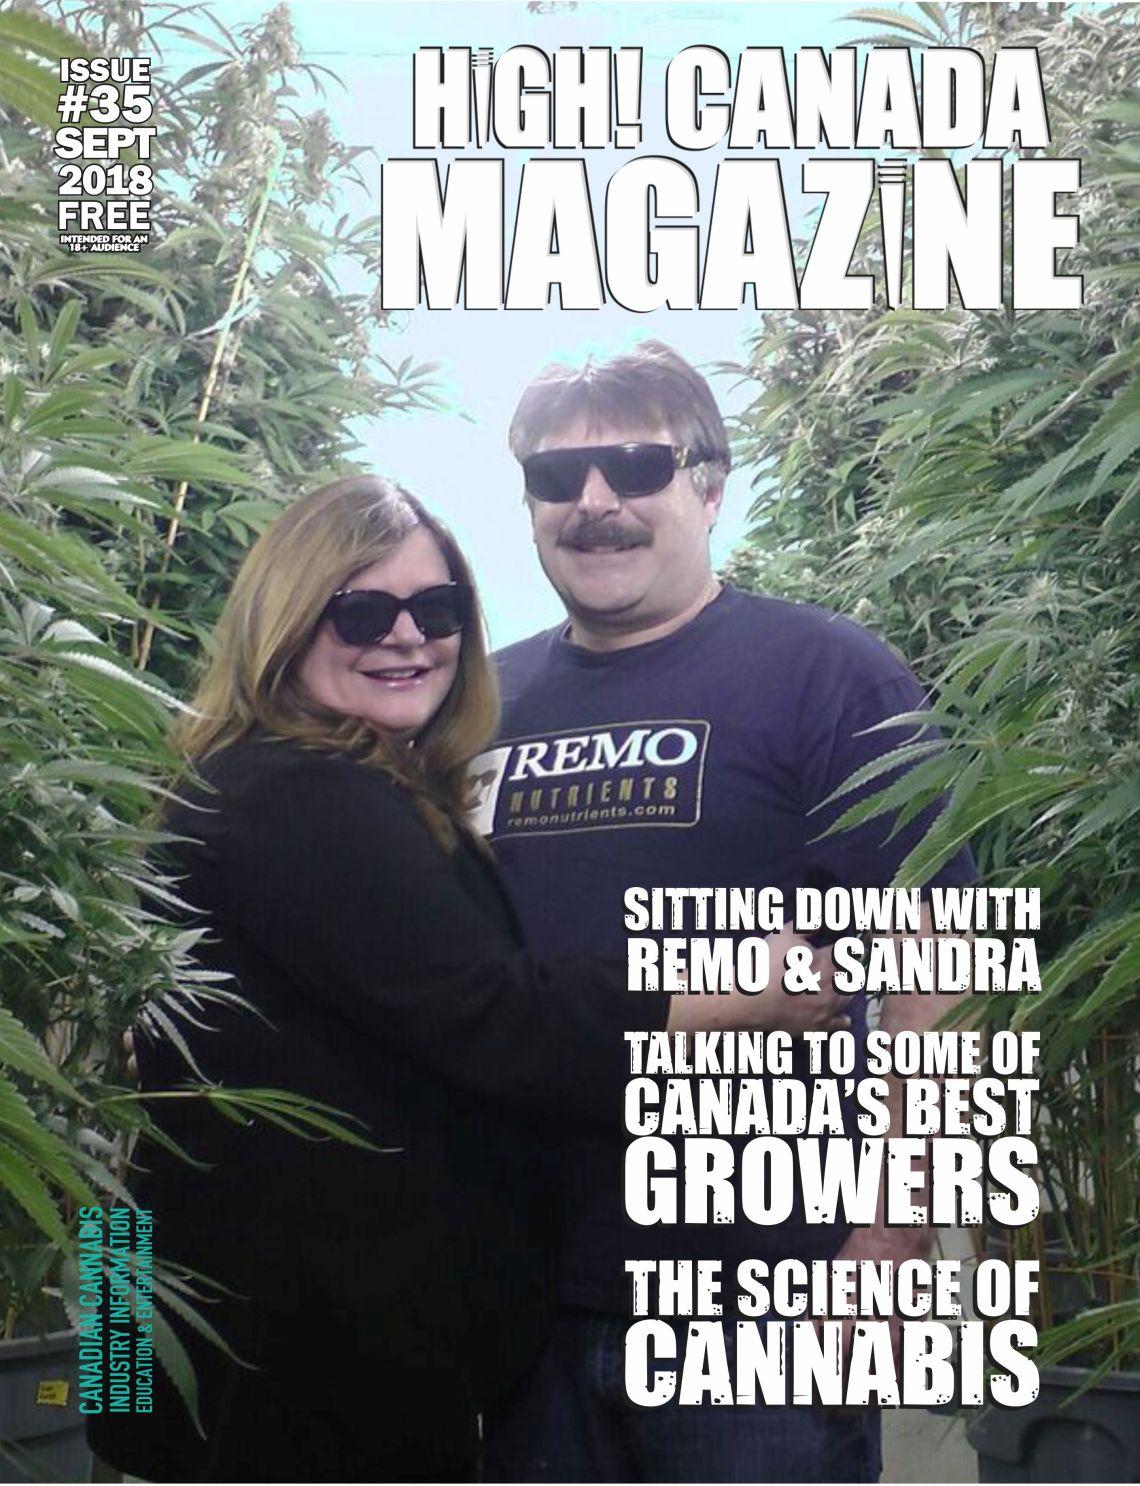 High! Canada Magazine Issue #35